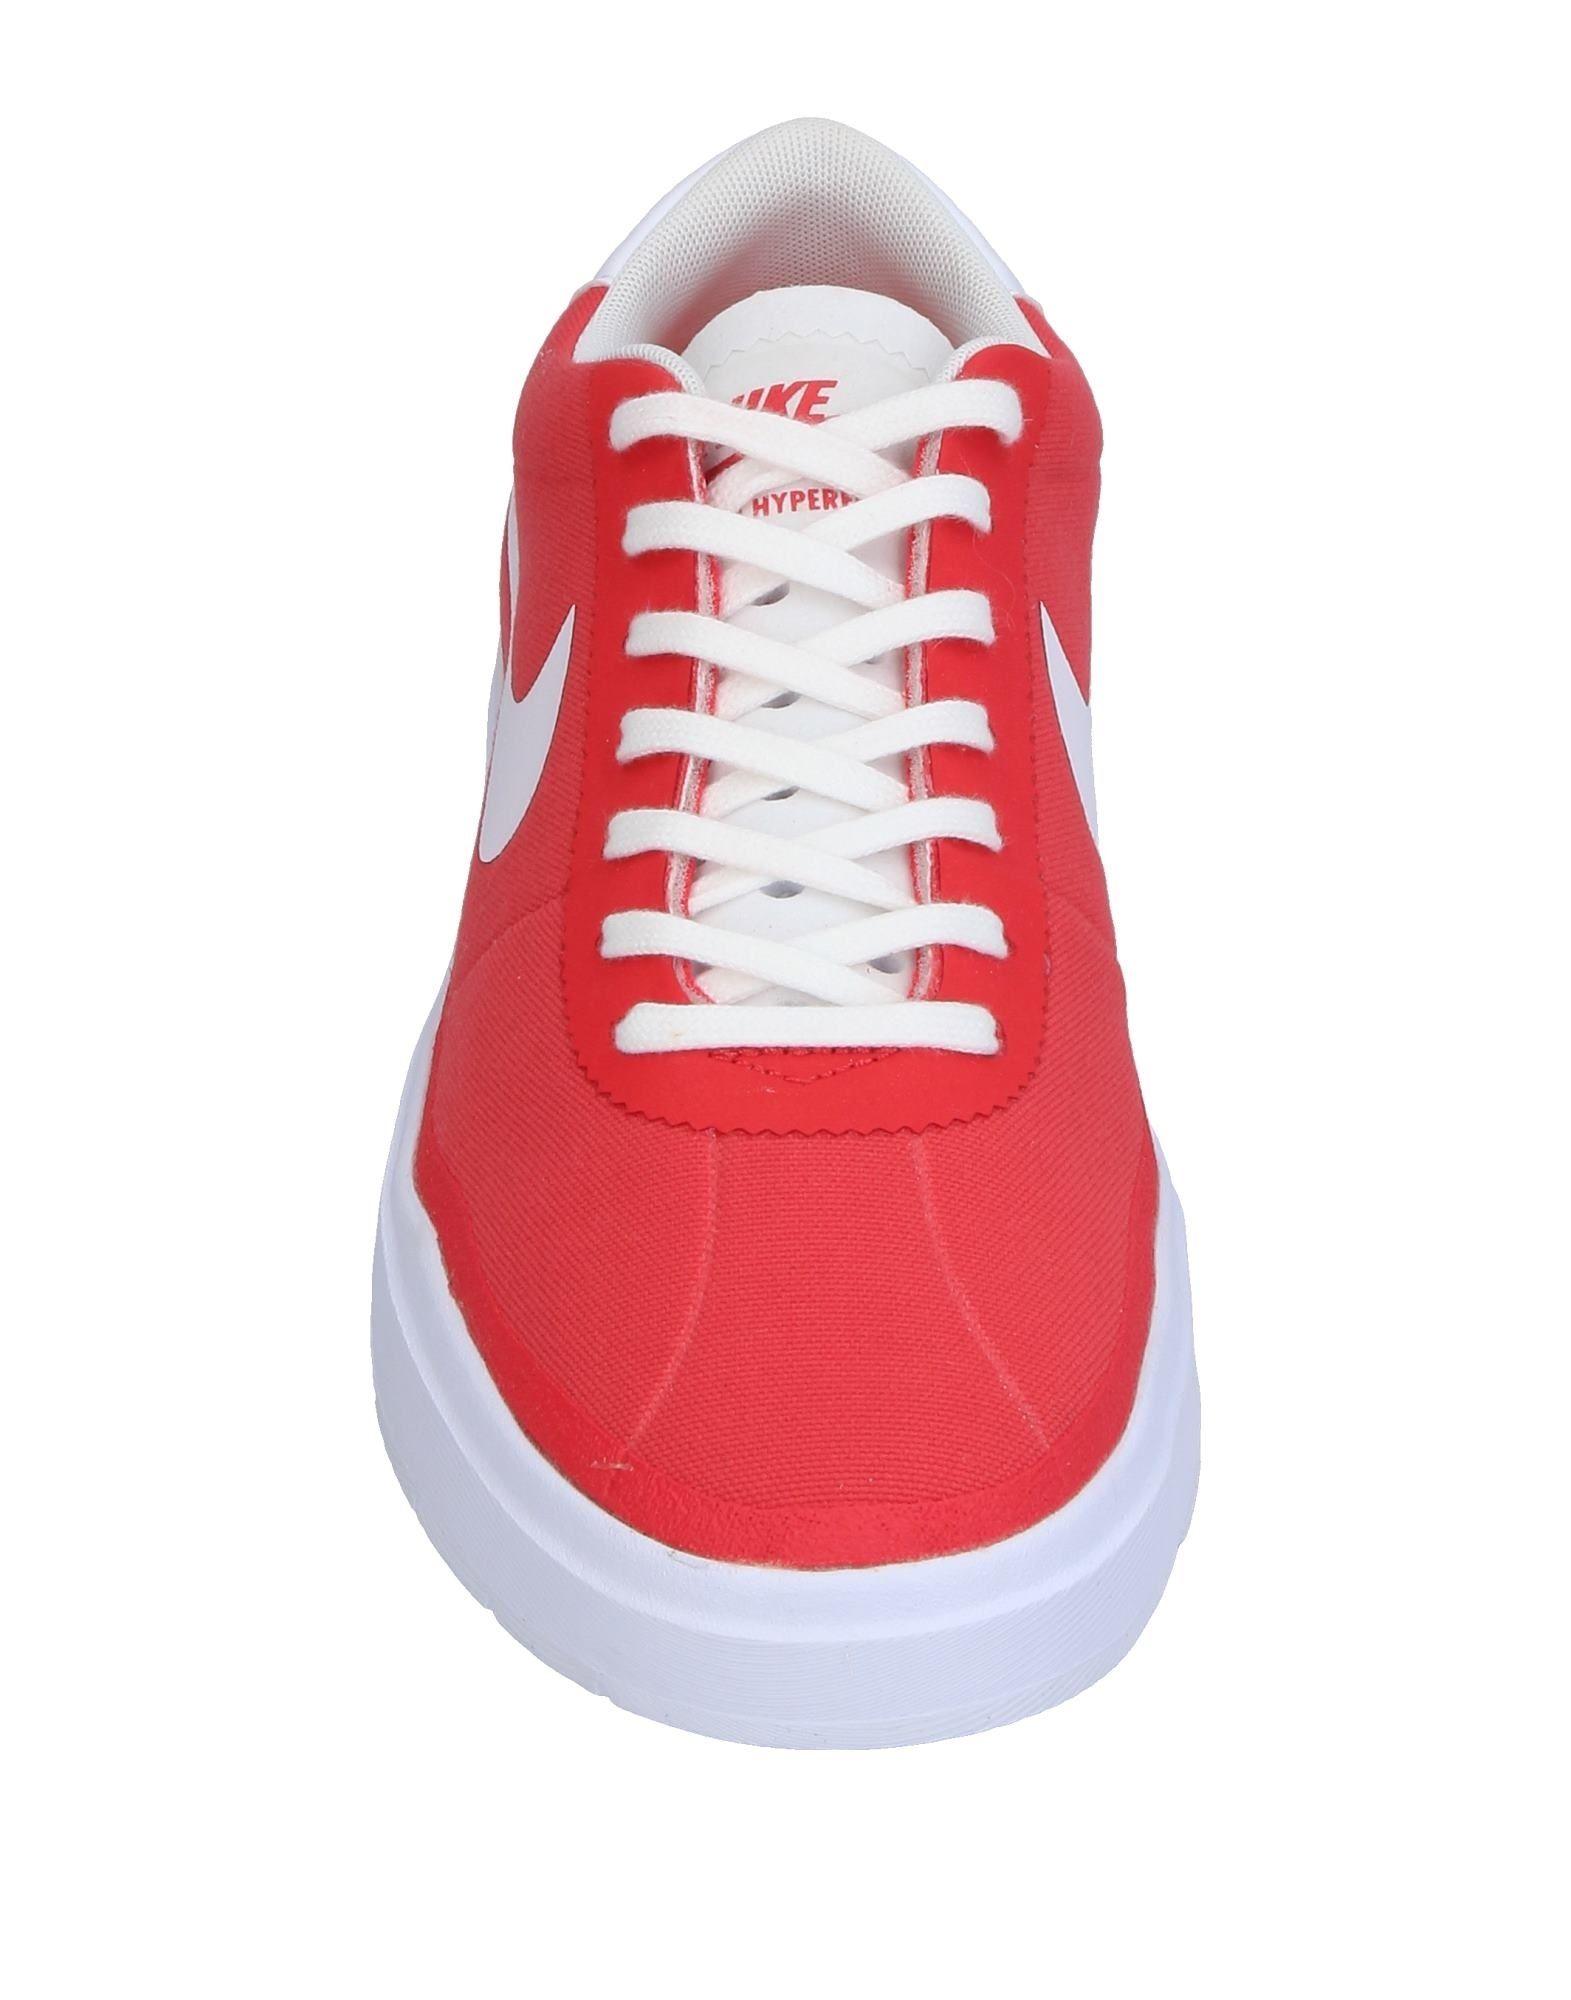 Rabatt echte Schuhe Nike Sb Collection Collection Sb Sneakers Herren  11378500AJ f097e4